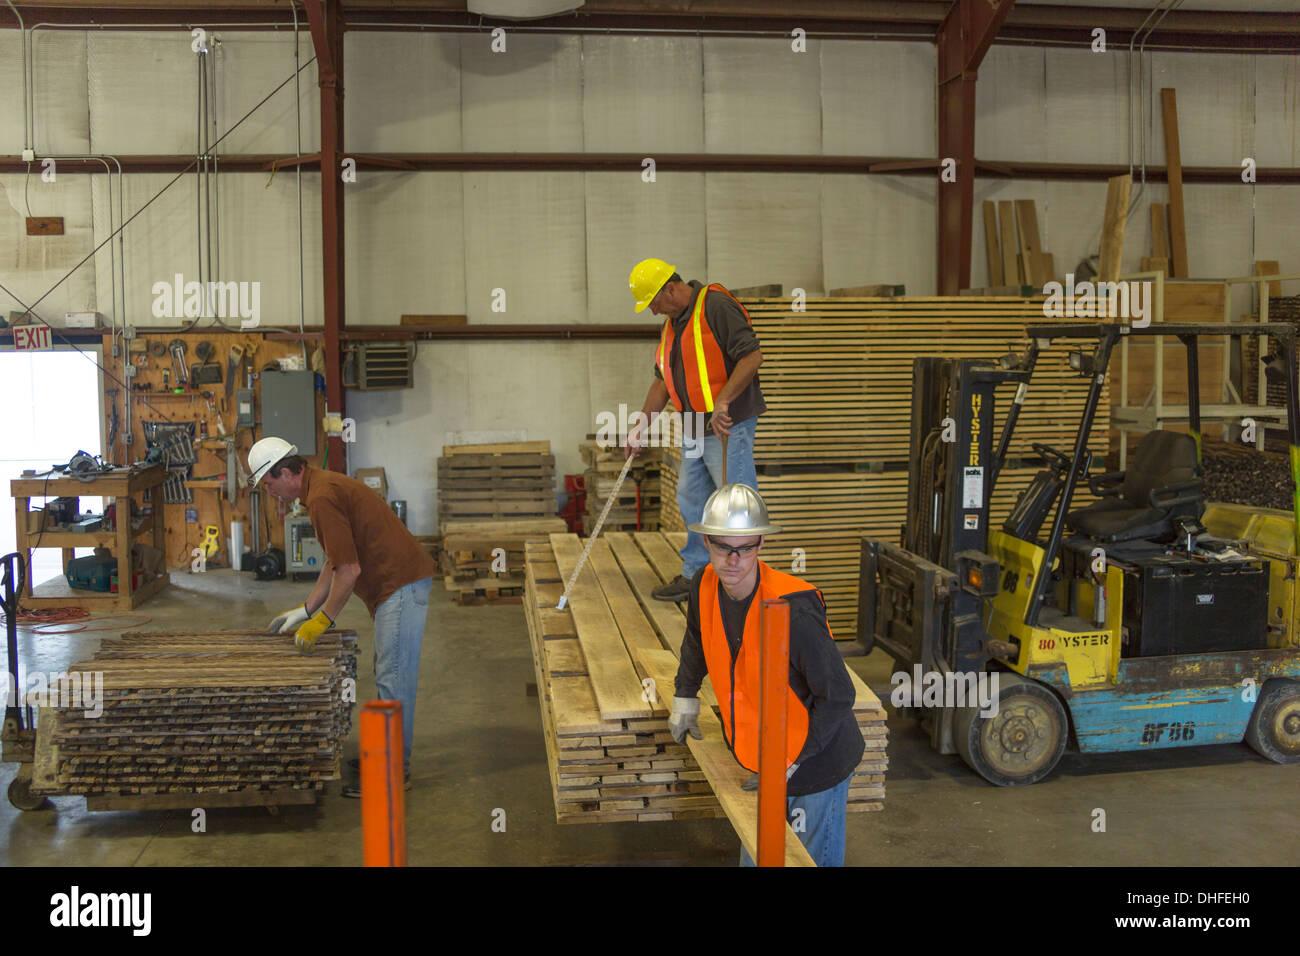 LUMBER GRADING WAREHOUSE WINDRIVER WOODWORKS LUMBER YARD JEFFERSON COUNTY PENNSYLVANIA USA - Stock Image